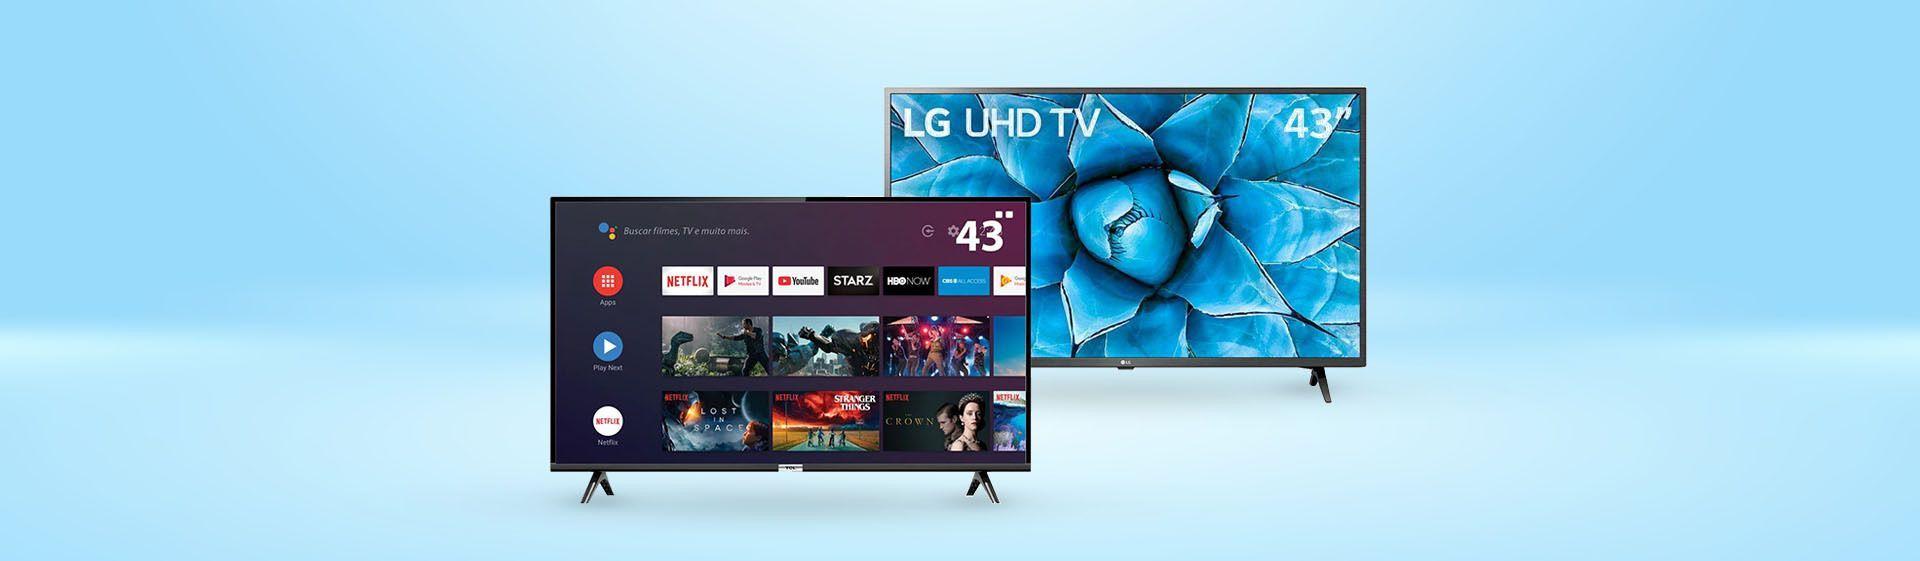 Smart TV de 43 polegadas: TCL S6500 vs LG UN7300, qual a melhor?